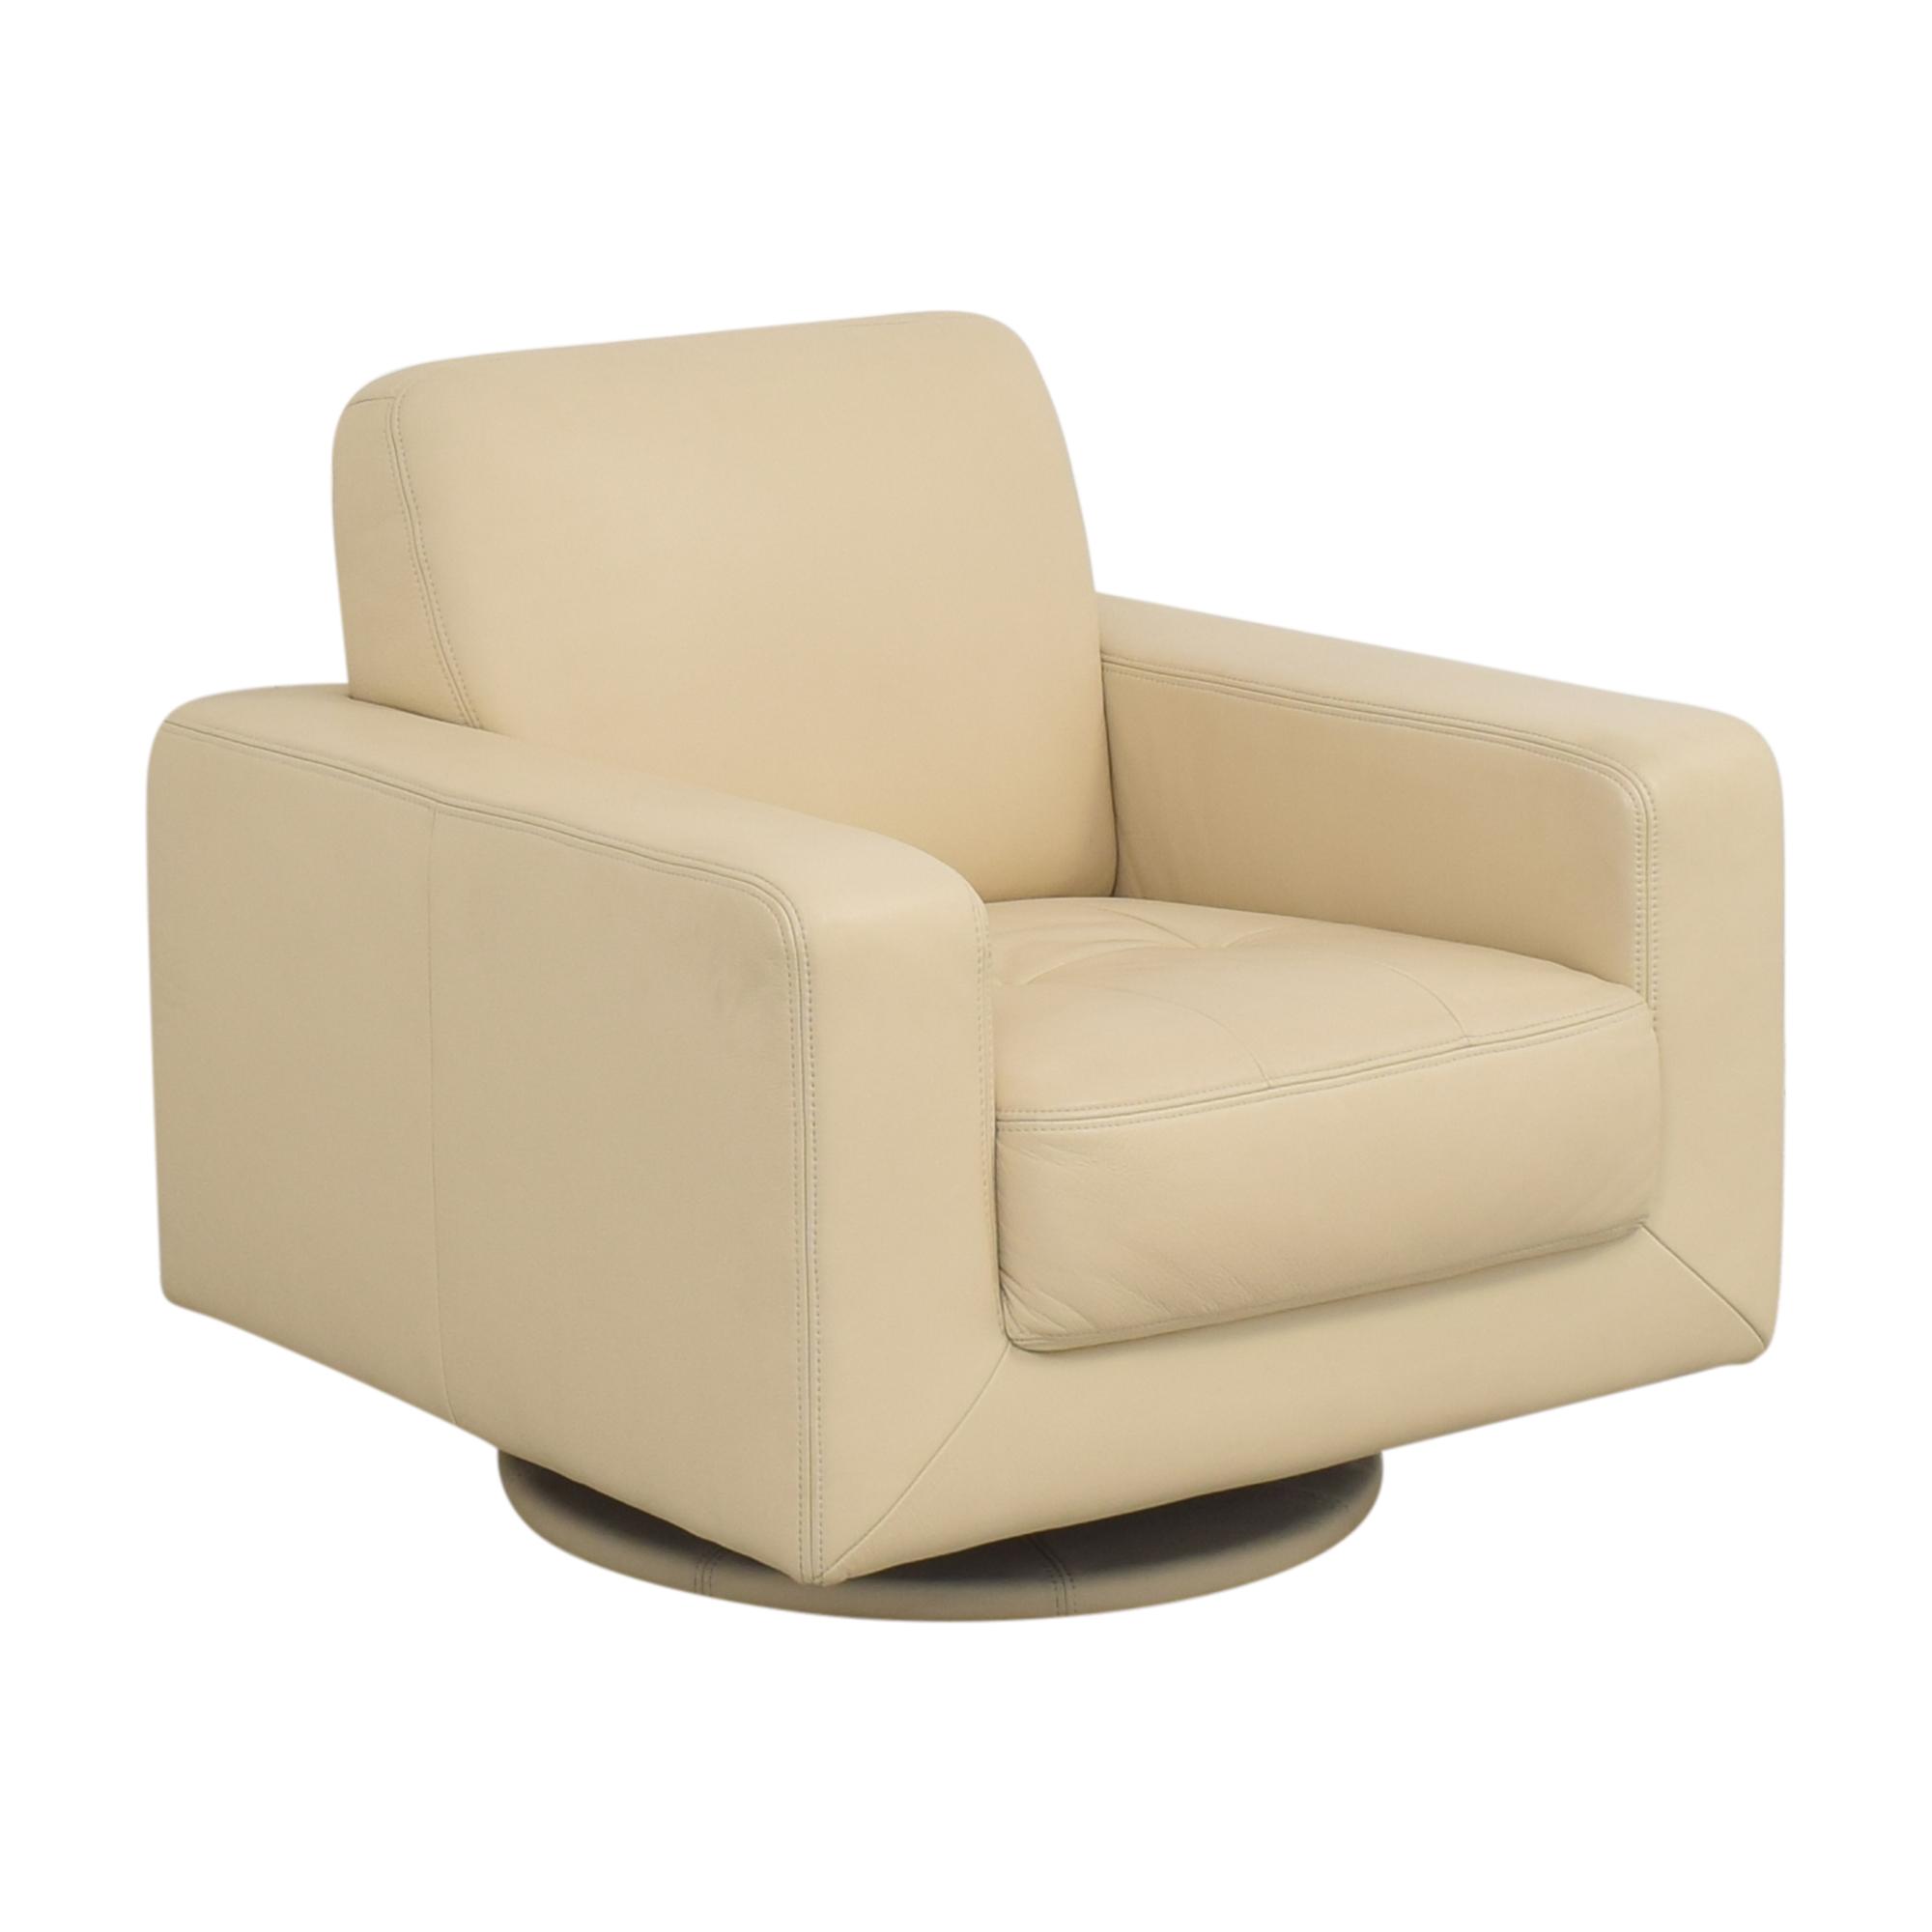 Maurice Villency Maurice Villency Bond Swivel Chair coupon